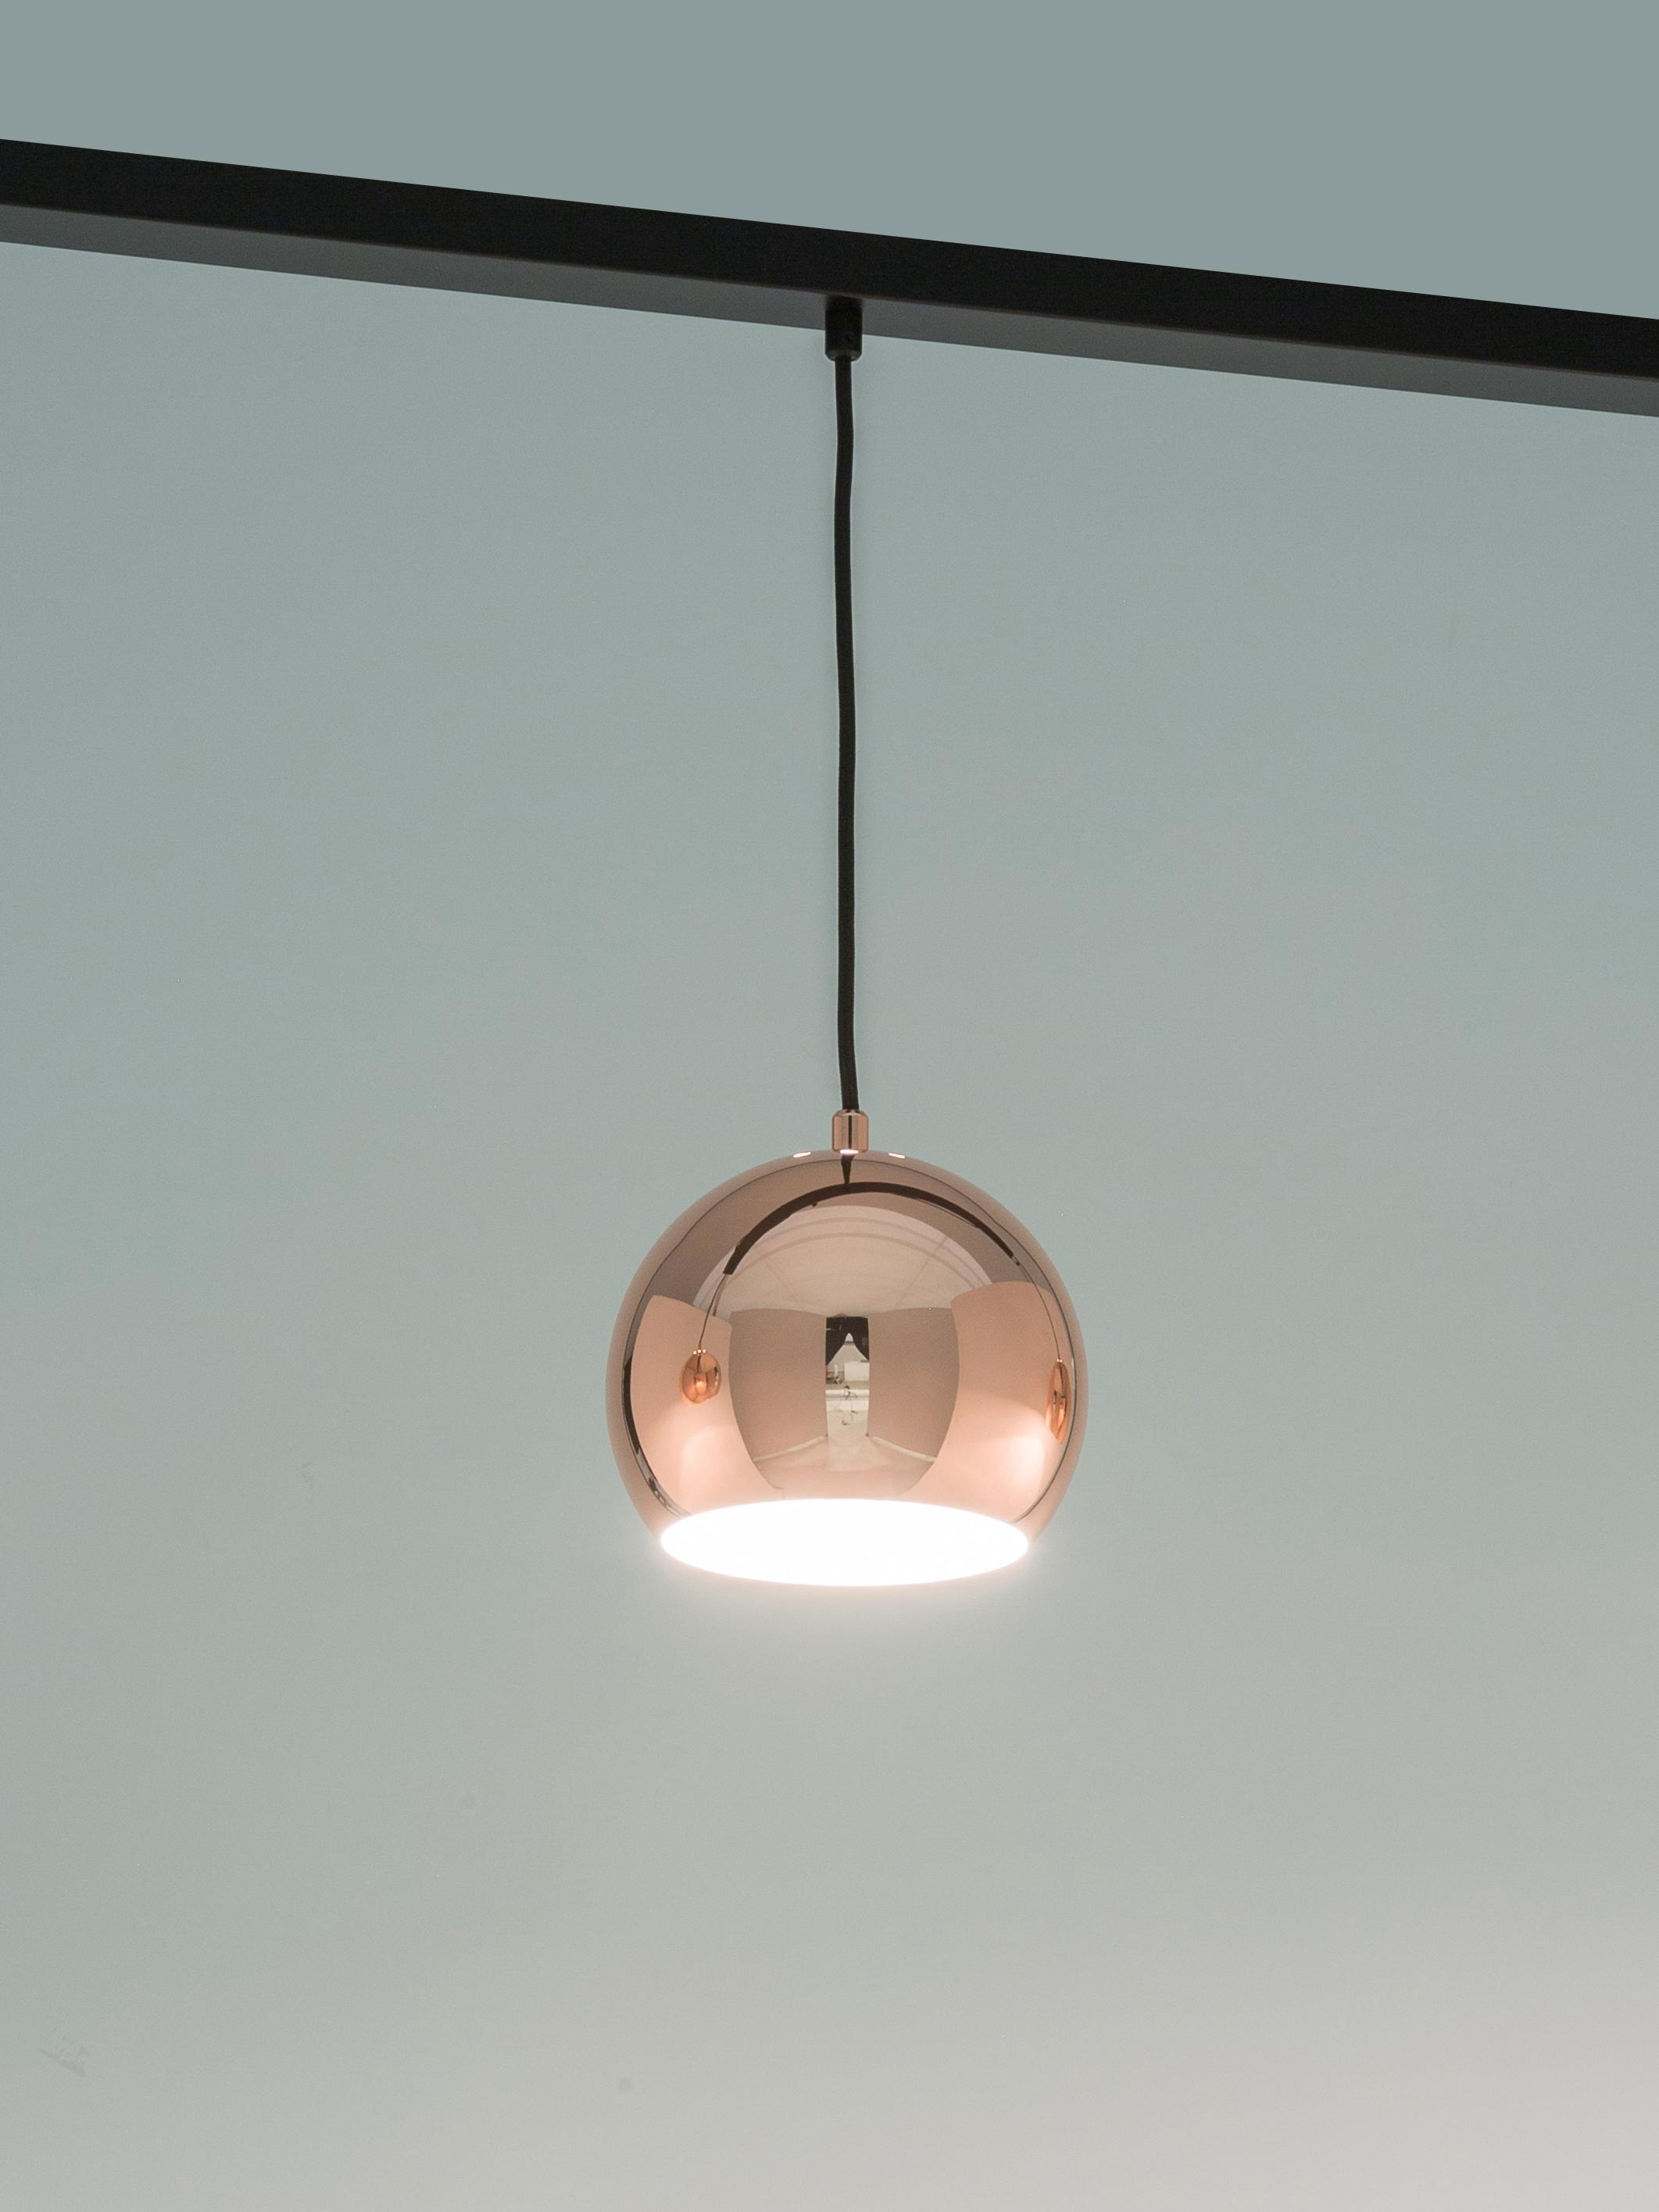 Lampada a sospensione a sfera in rame Ball, Baldacchino: metallo verniciato, Paralume: metallo ramato, Rame luccicante, nero opaco, Larg. 100 x Alt. 168 cm